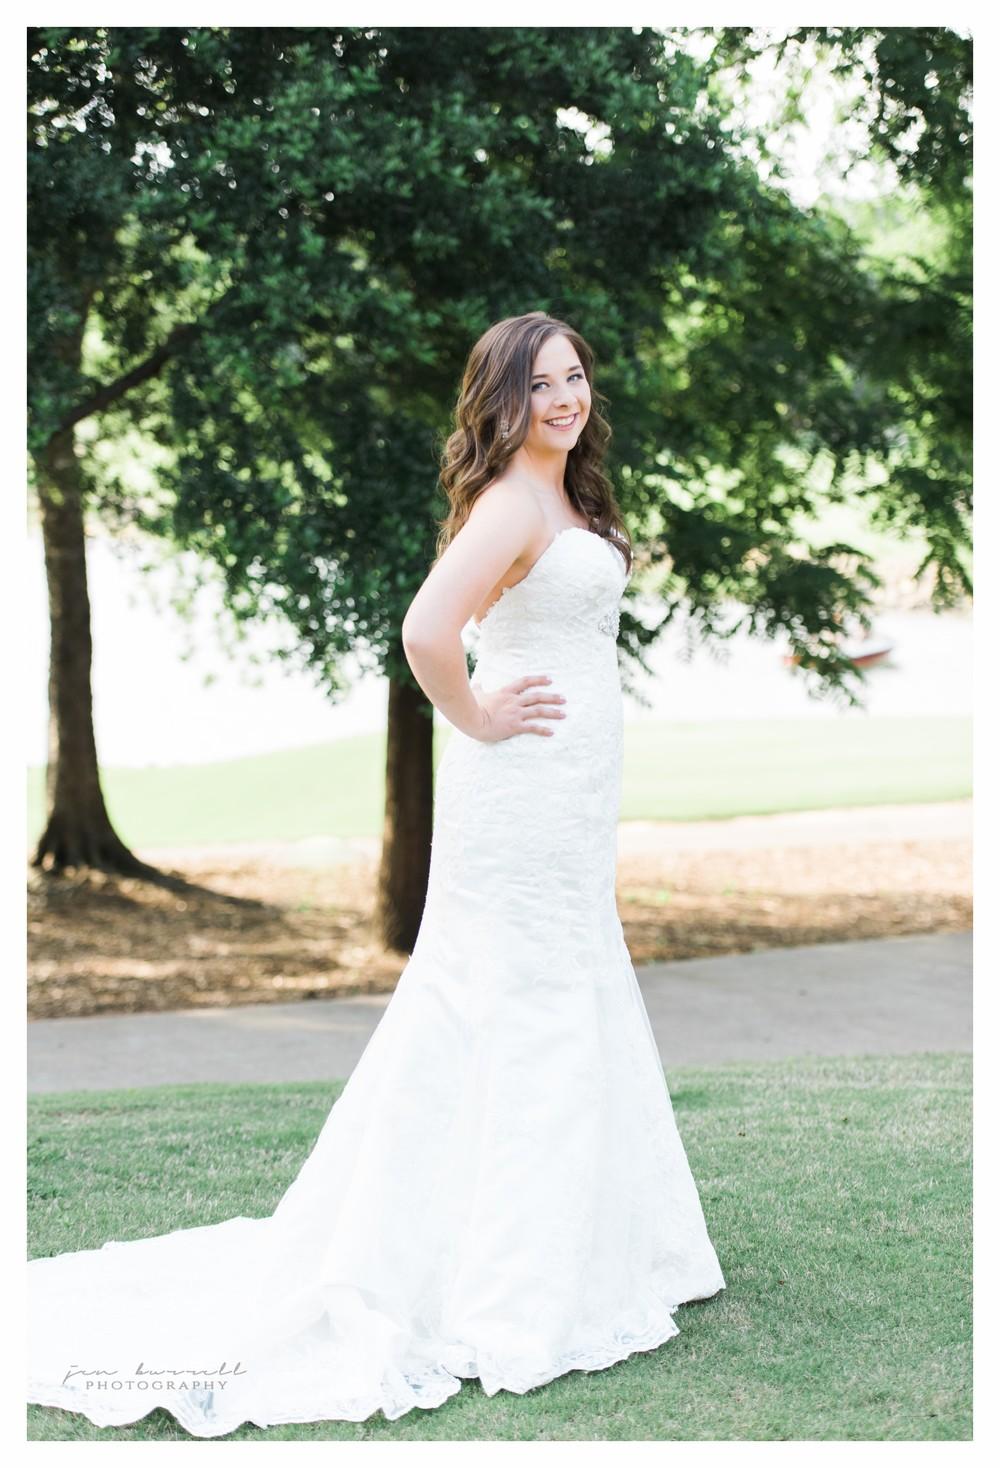 Bridal Session Blog 4.jpg